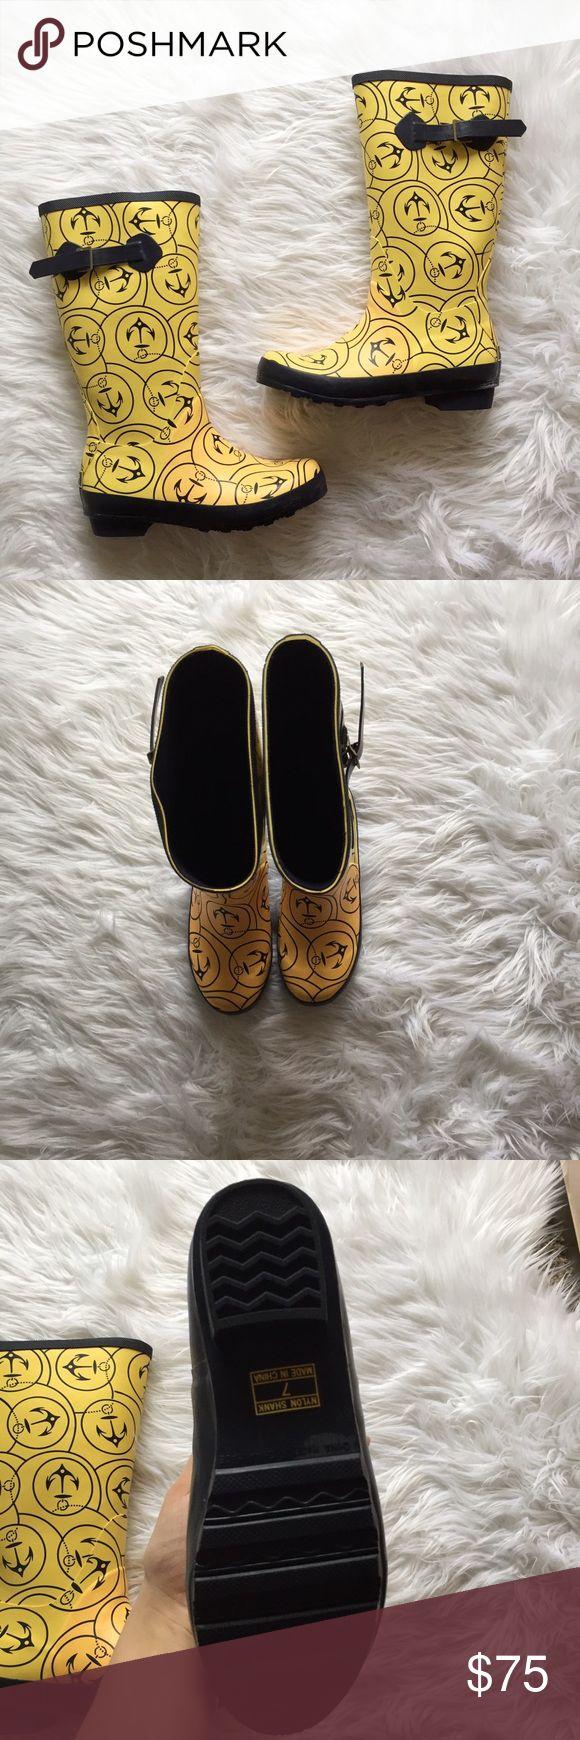 LL Bean Anchor Rain Boots Gorgeous LL Bean Anchor rainboots in excellent condition. So cute! Perfect for spring! 7cddfg L.L. Bean Shoes Winter & Rain Boots